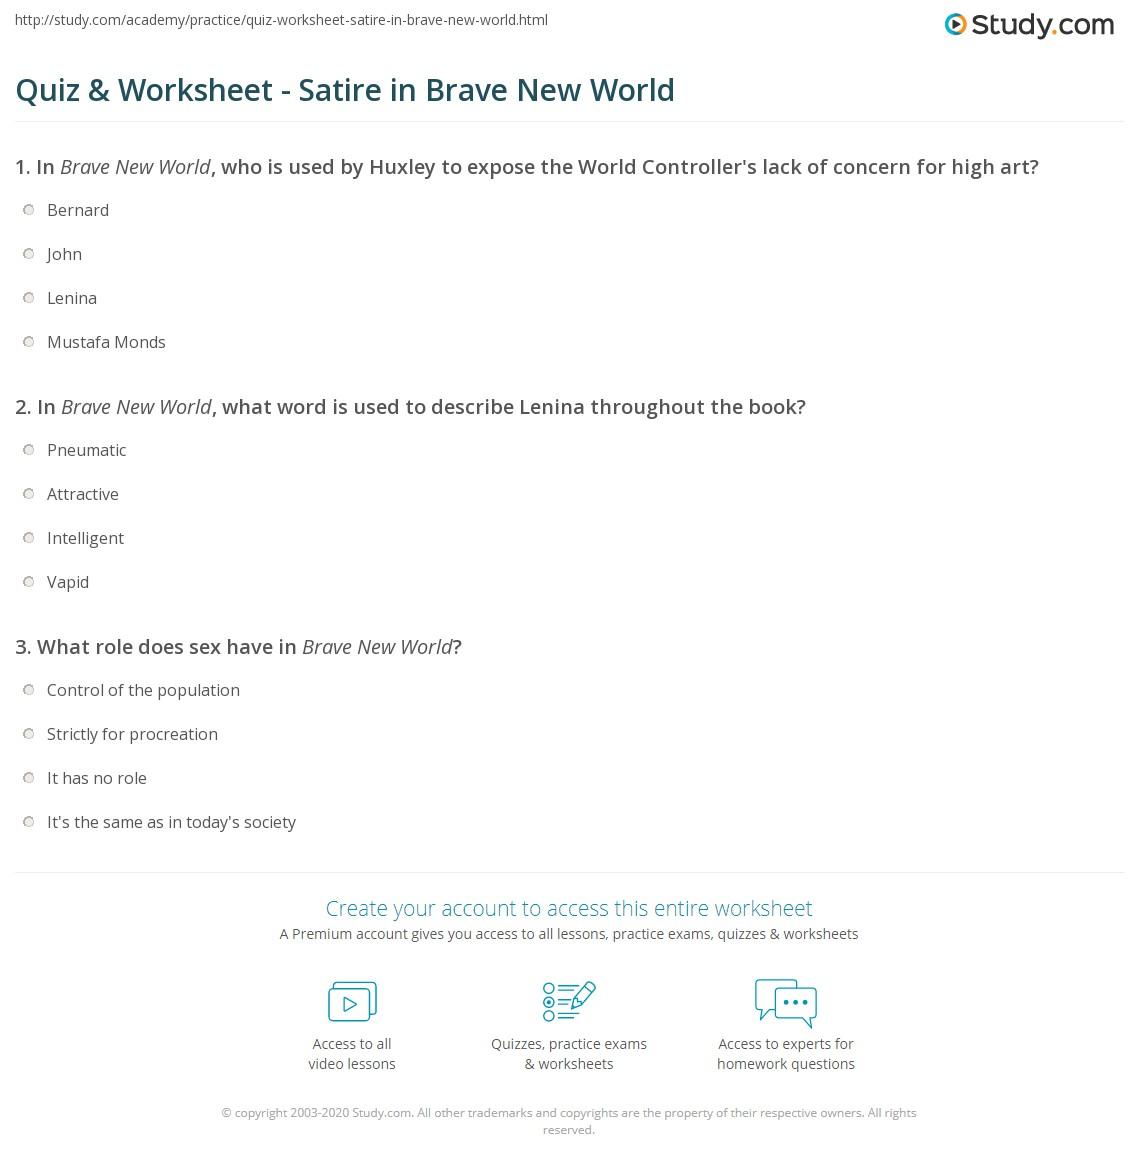 Sarcasm and Irony worksheet - Free ESL printable worksheets made ...